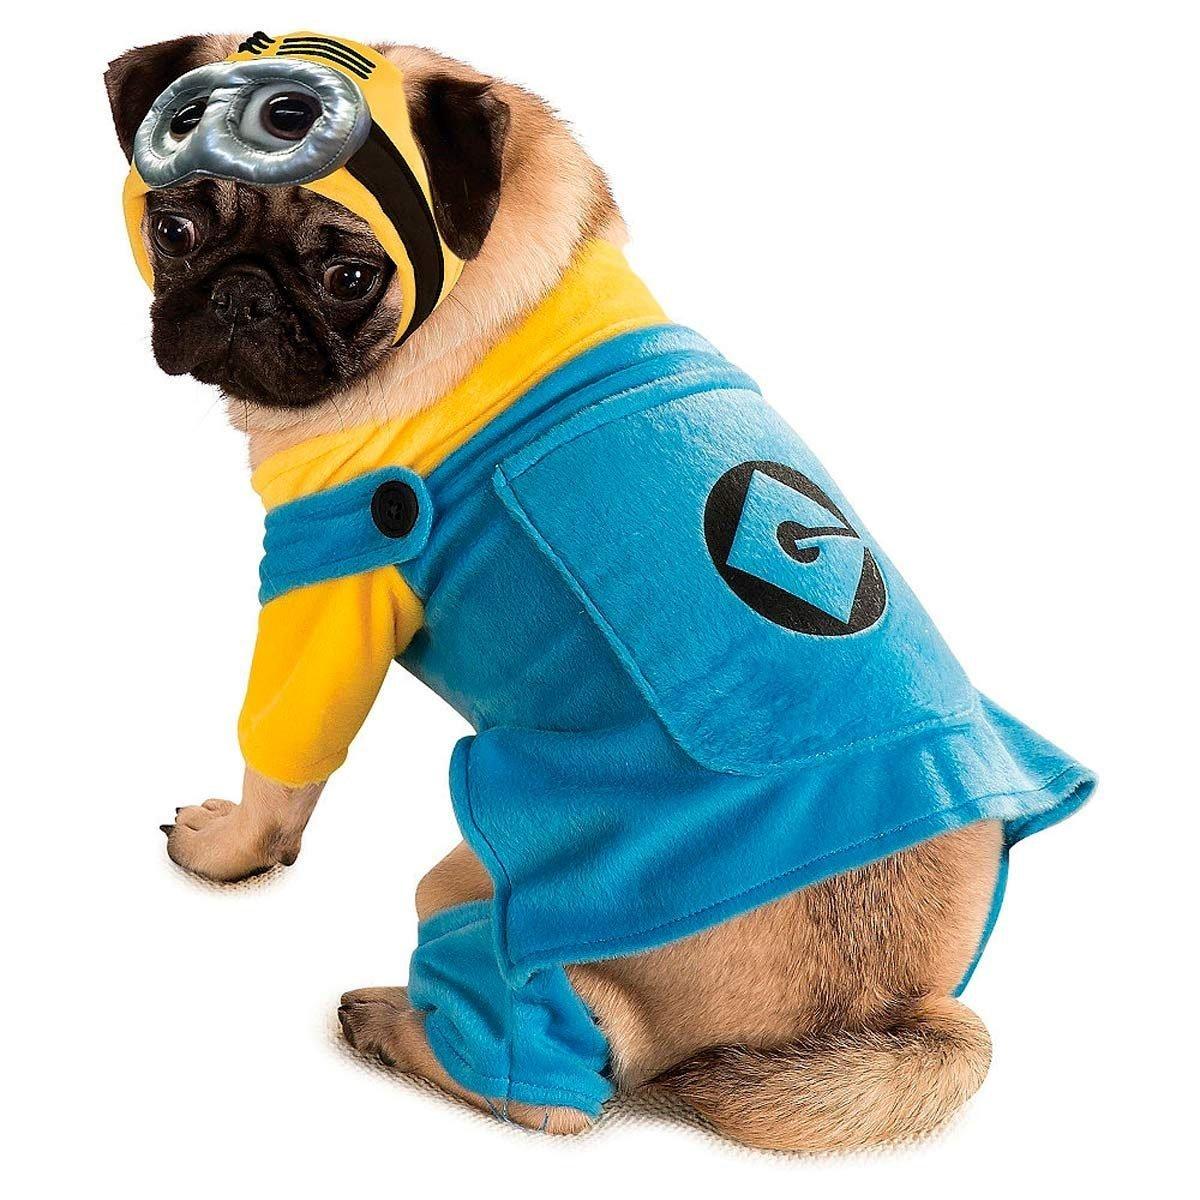 10 Best Dog Halloween Costumes